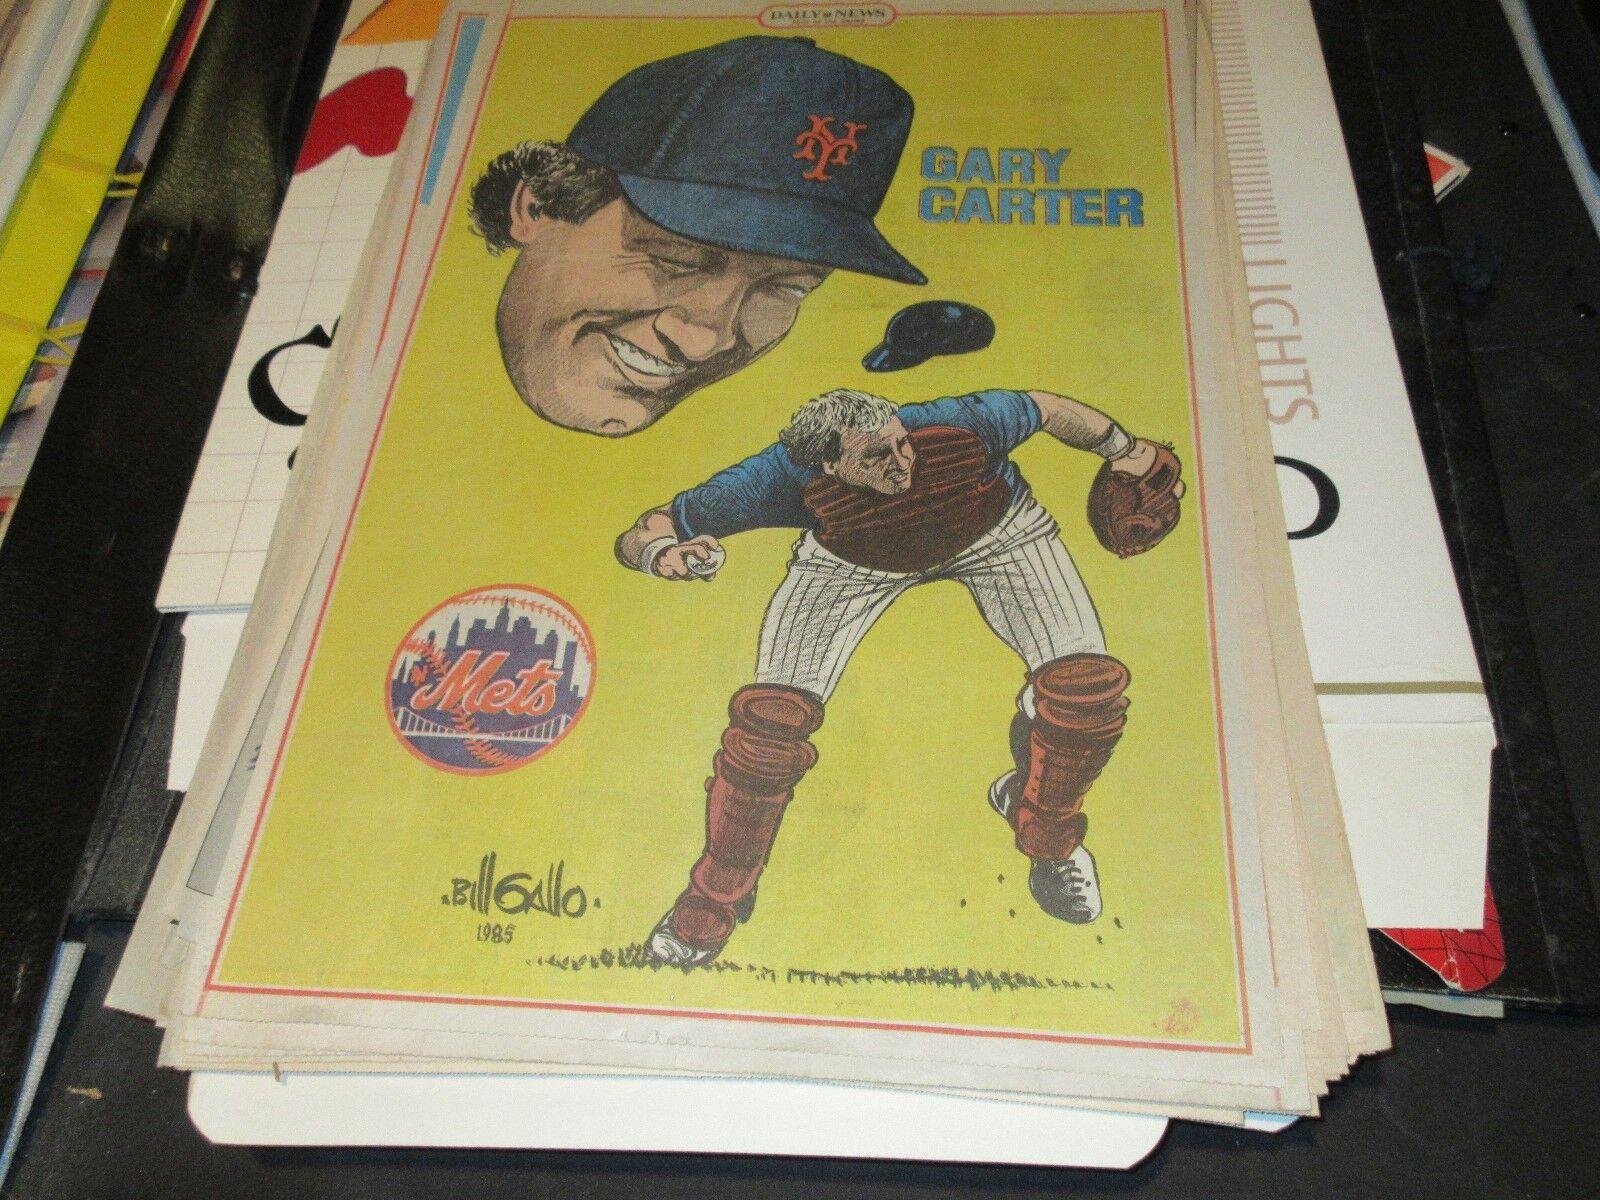 Gary Carter , New York Mets , New York Daily News Comic